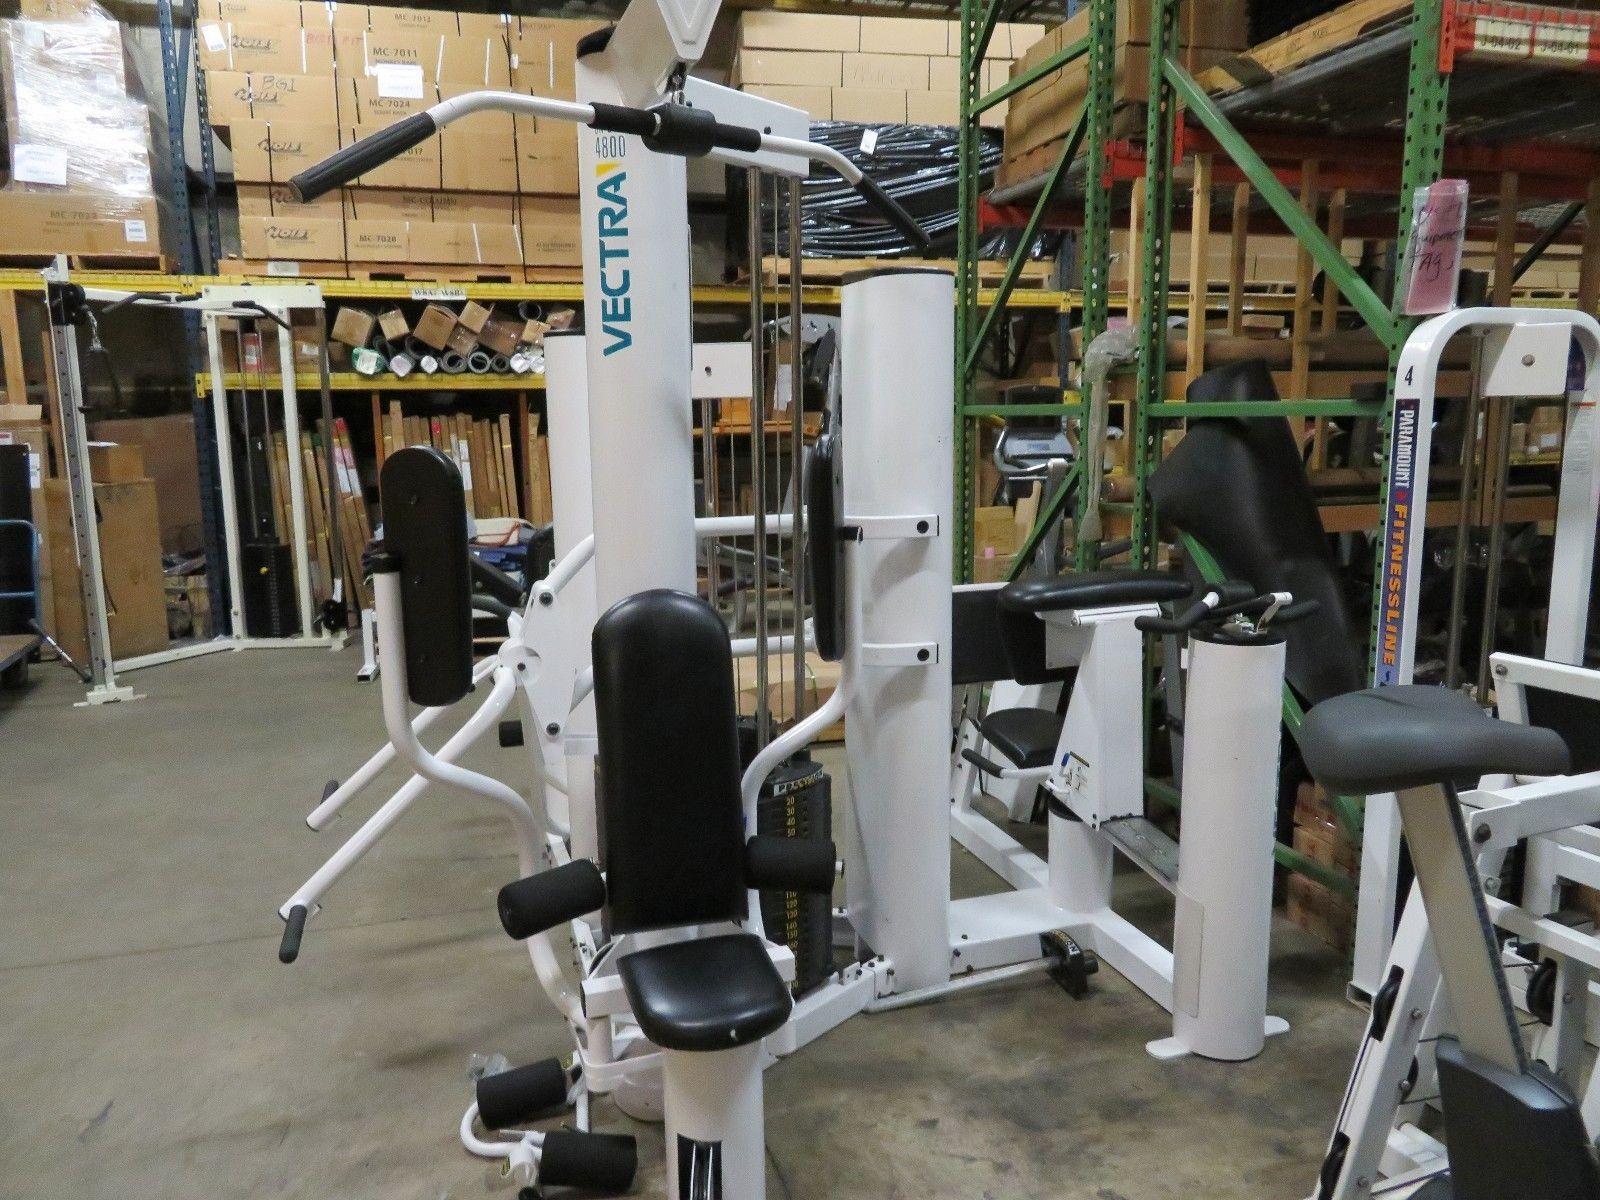 Vectra 4800 Multi station Universal Commercial or Home Gym (eBay Link) 3efcf98e4e1